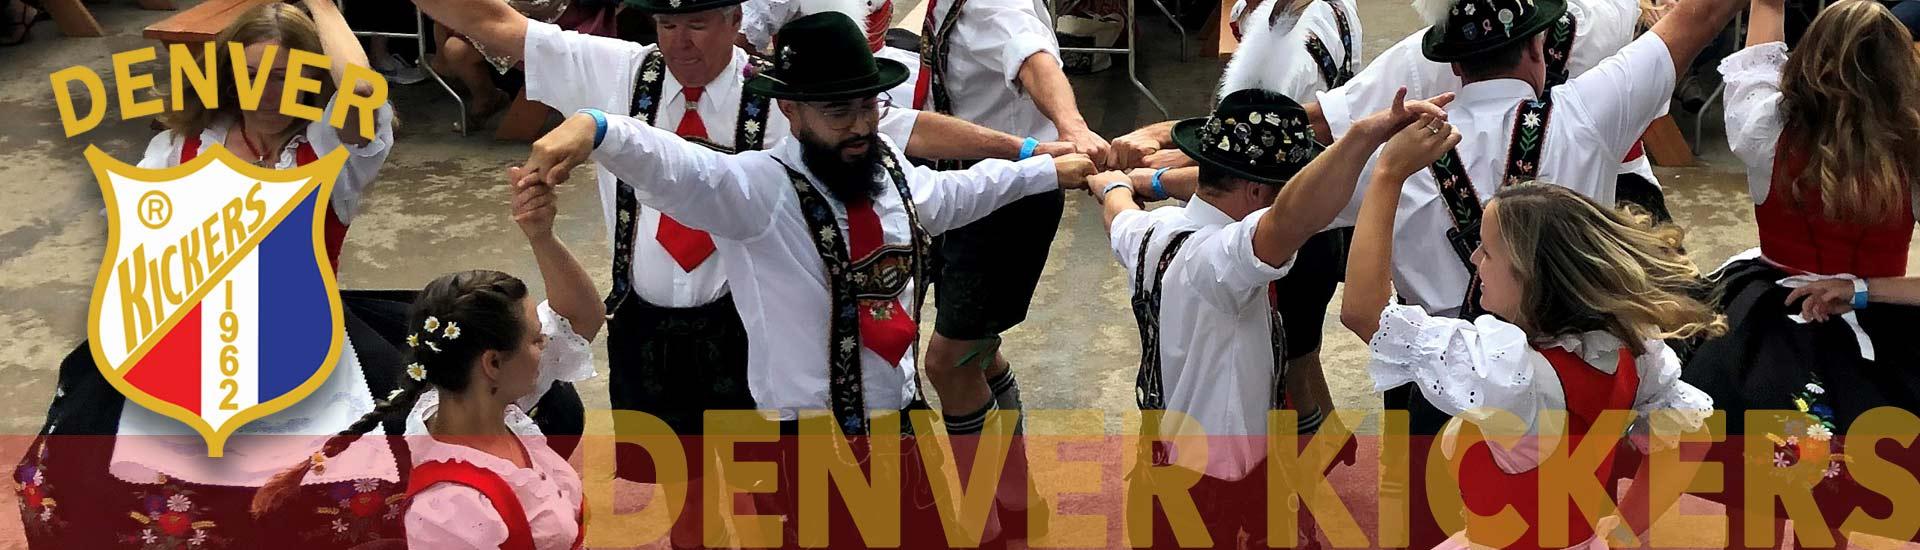 Denver Kickers Events